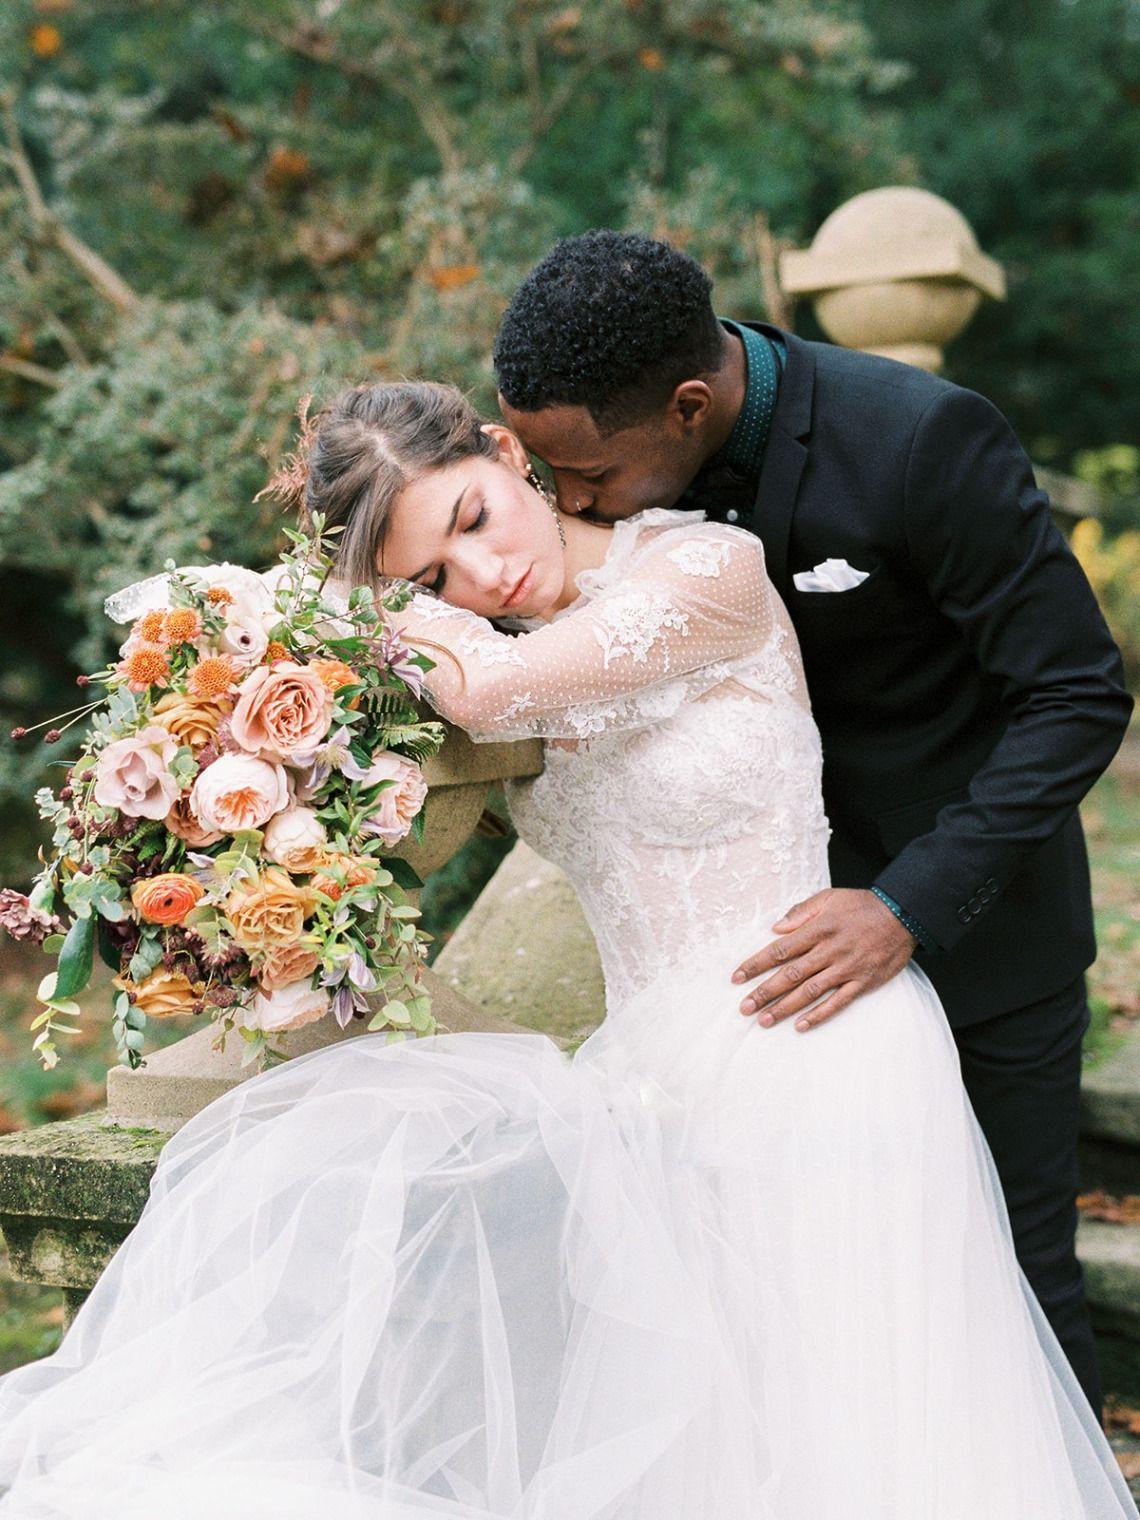 Pin on Interracial Wedding